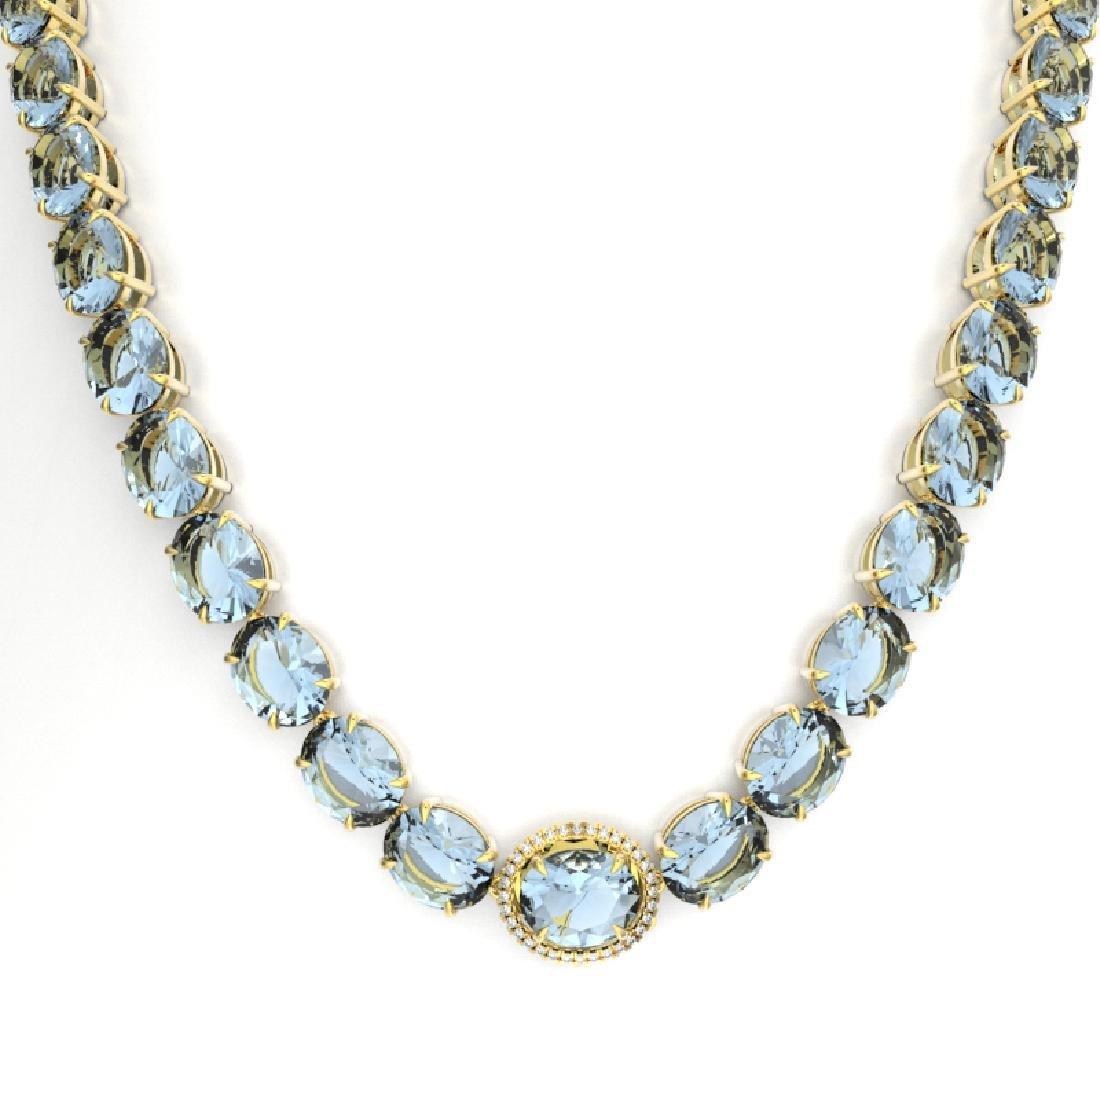 136 CTW Aquamarine & VS/SI Diamond Necklace 14K Yellow - 2